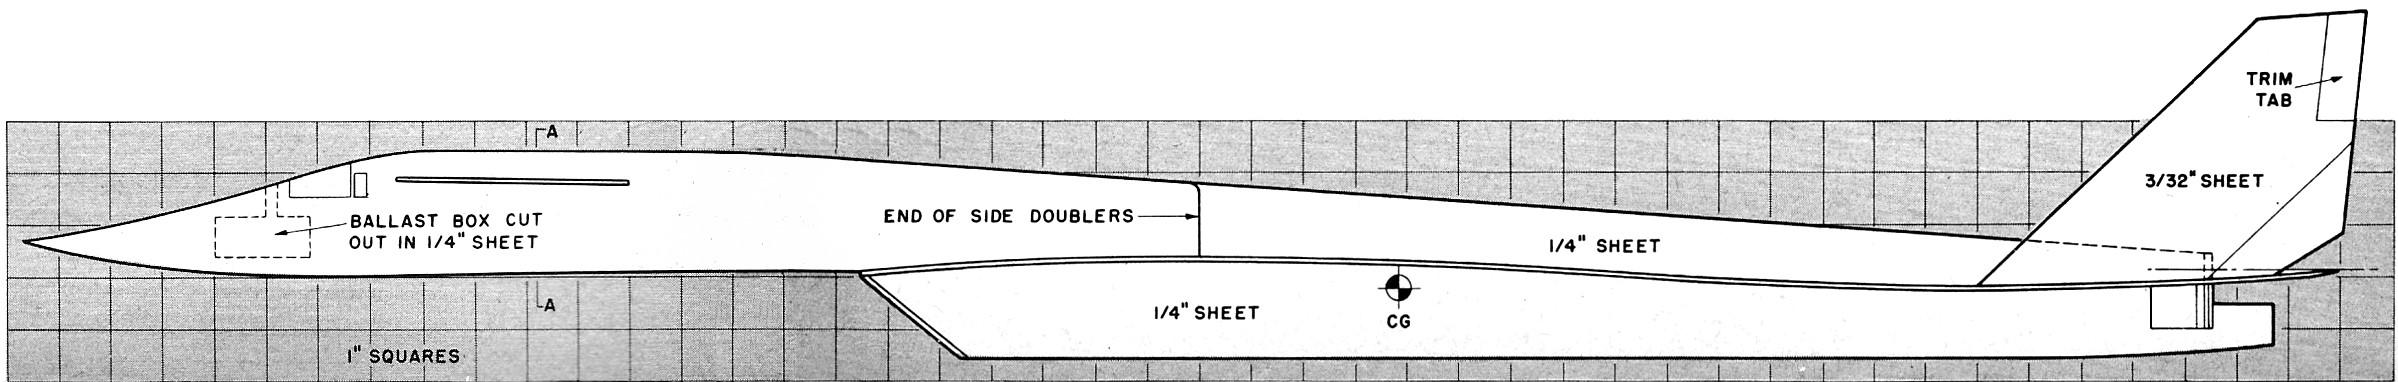 Free Flight Sensation: Bob Linn's B-70 Article & Plans, May